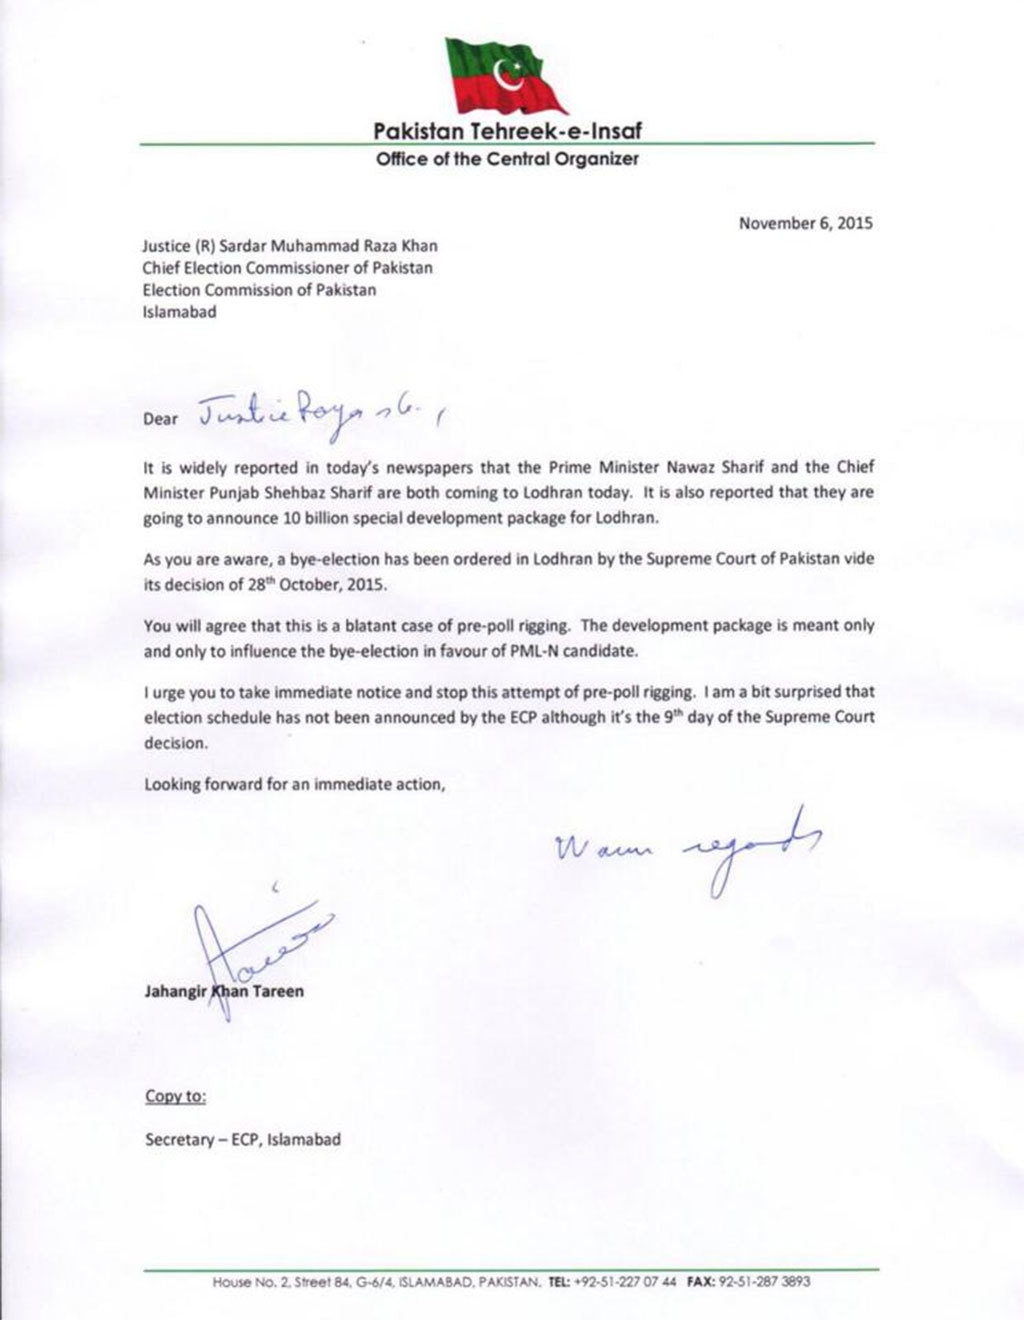 Copy of Jahangir Khan Tareen's letter to CEC